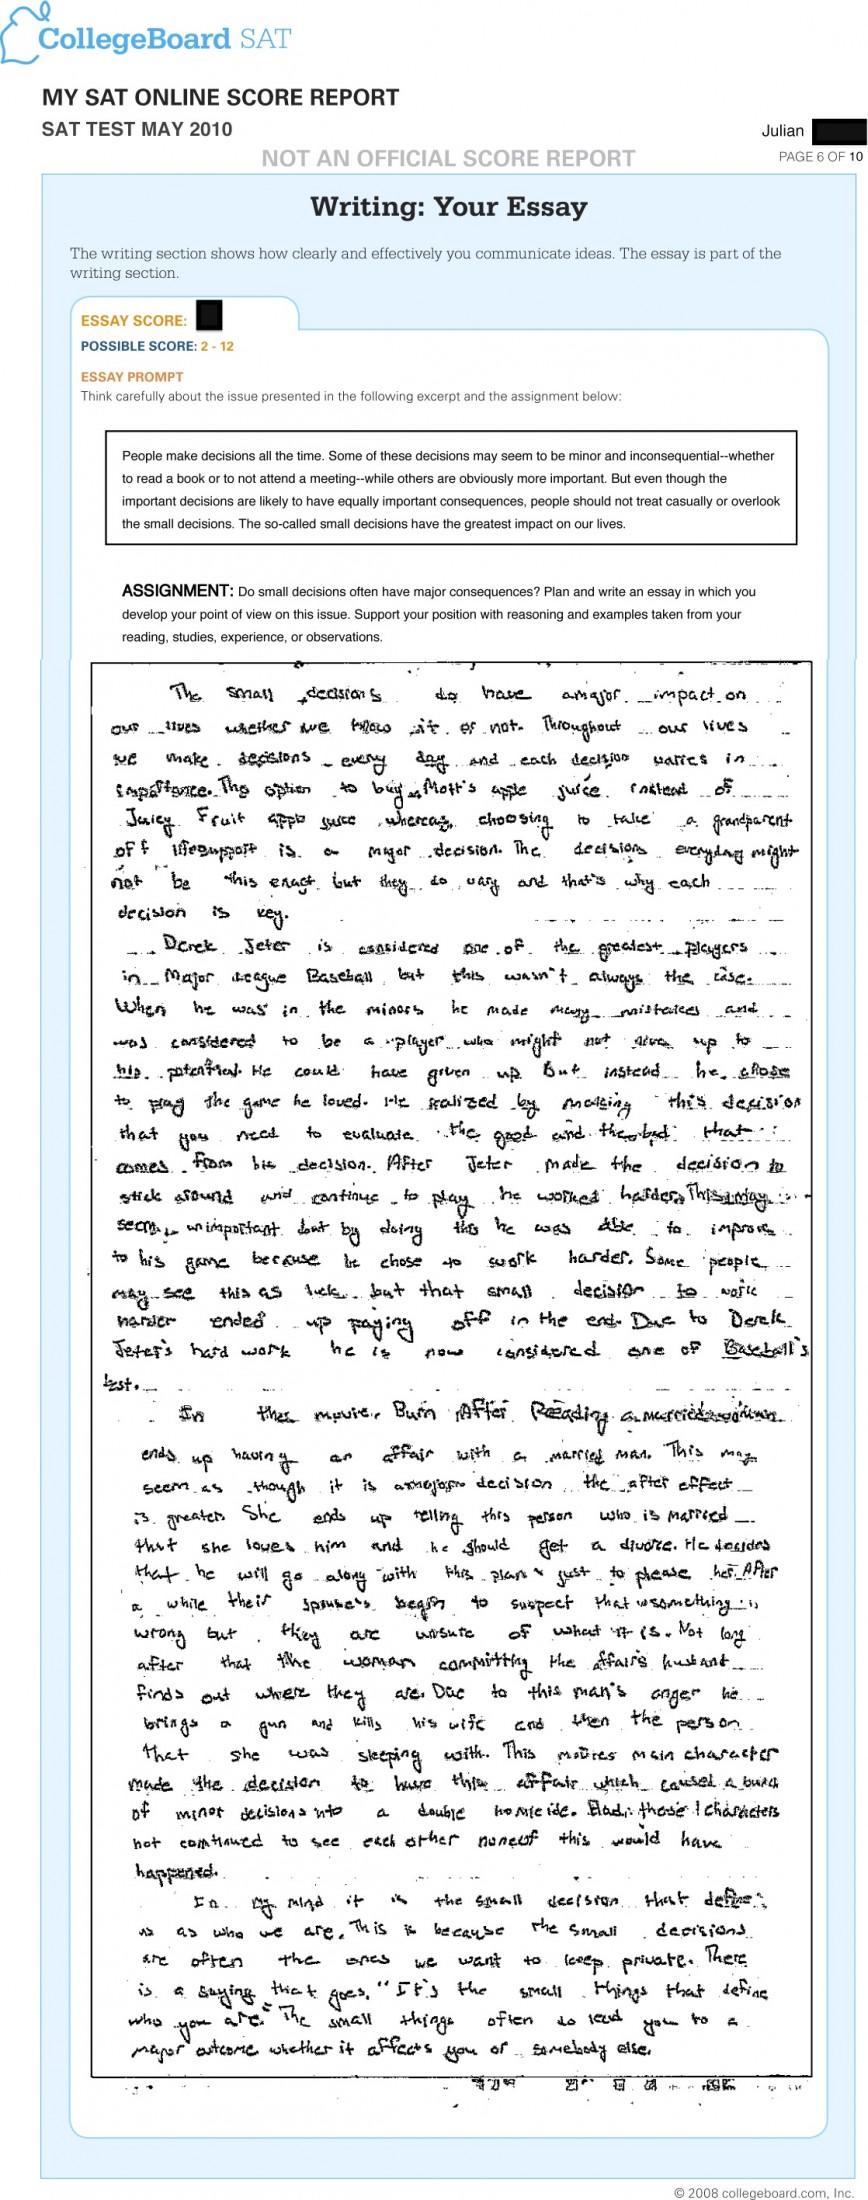 003 Essay Example Jr May Sat Amazing Scoring Rubric Pdf Score Percentiles 2018